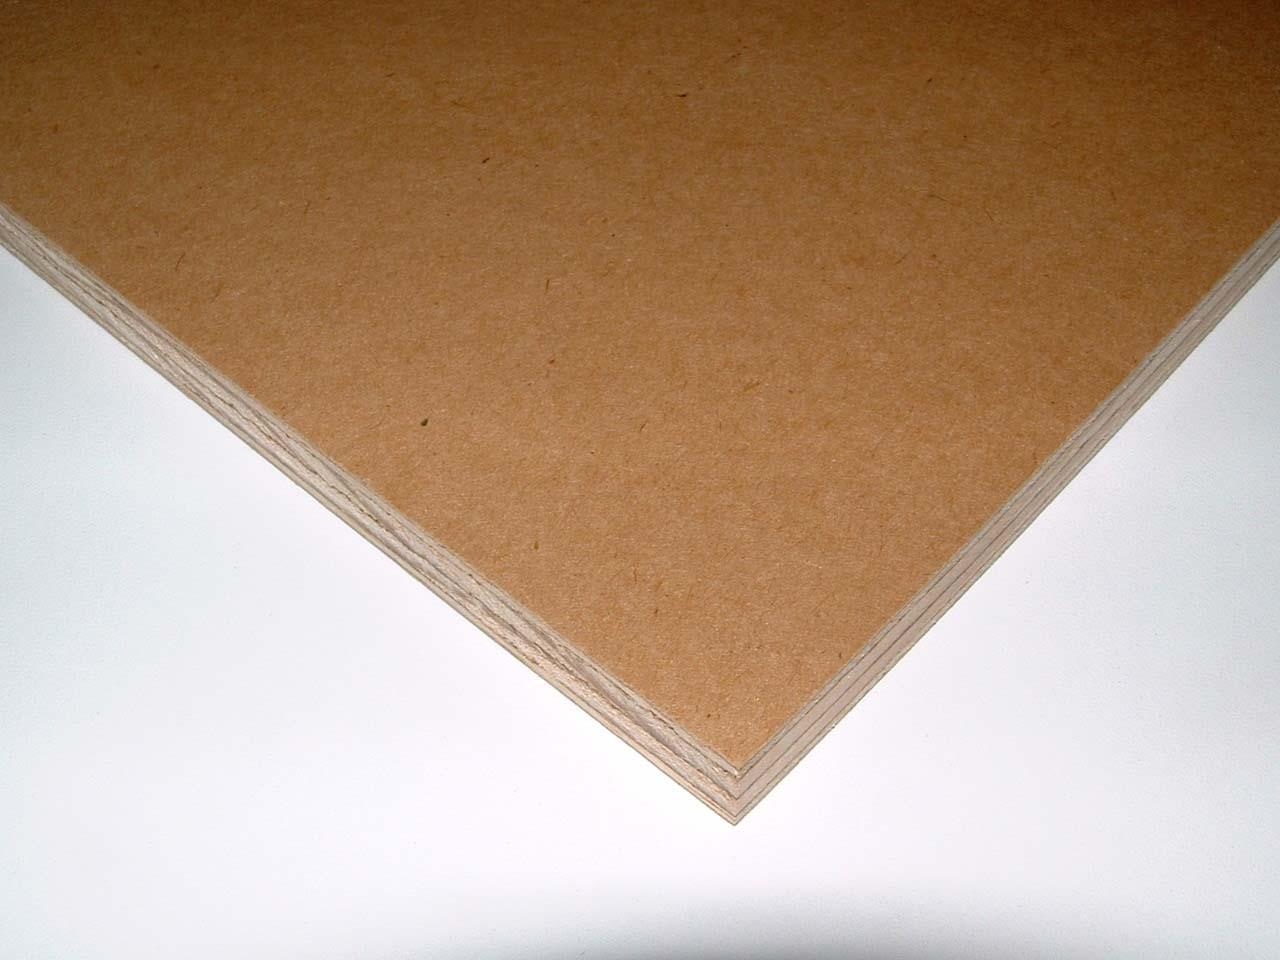 Medium Density Overlay Panel ~ Review medium density overlay mdo plywood for jig